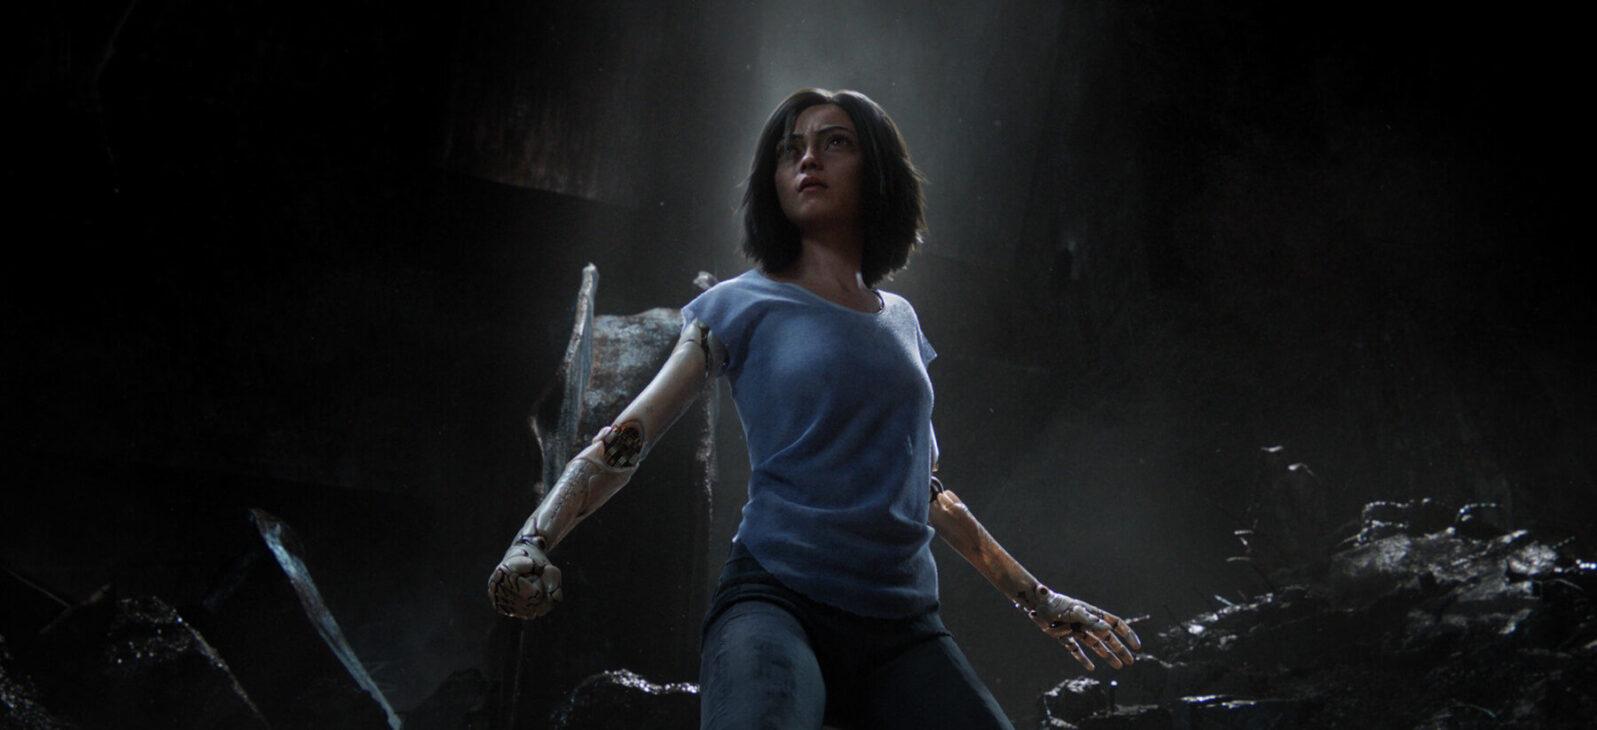 Still from the movie Alita, Battle Angel